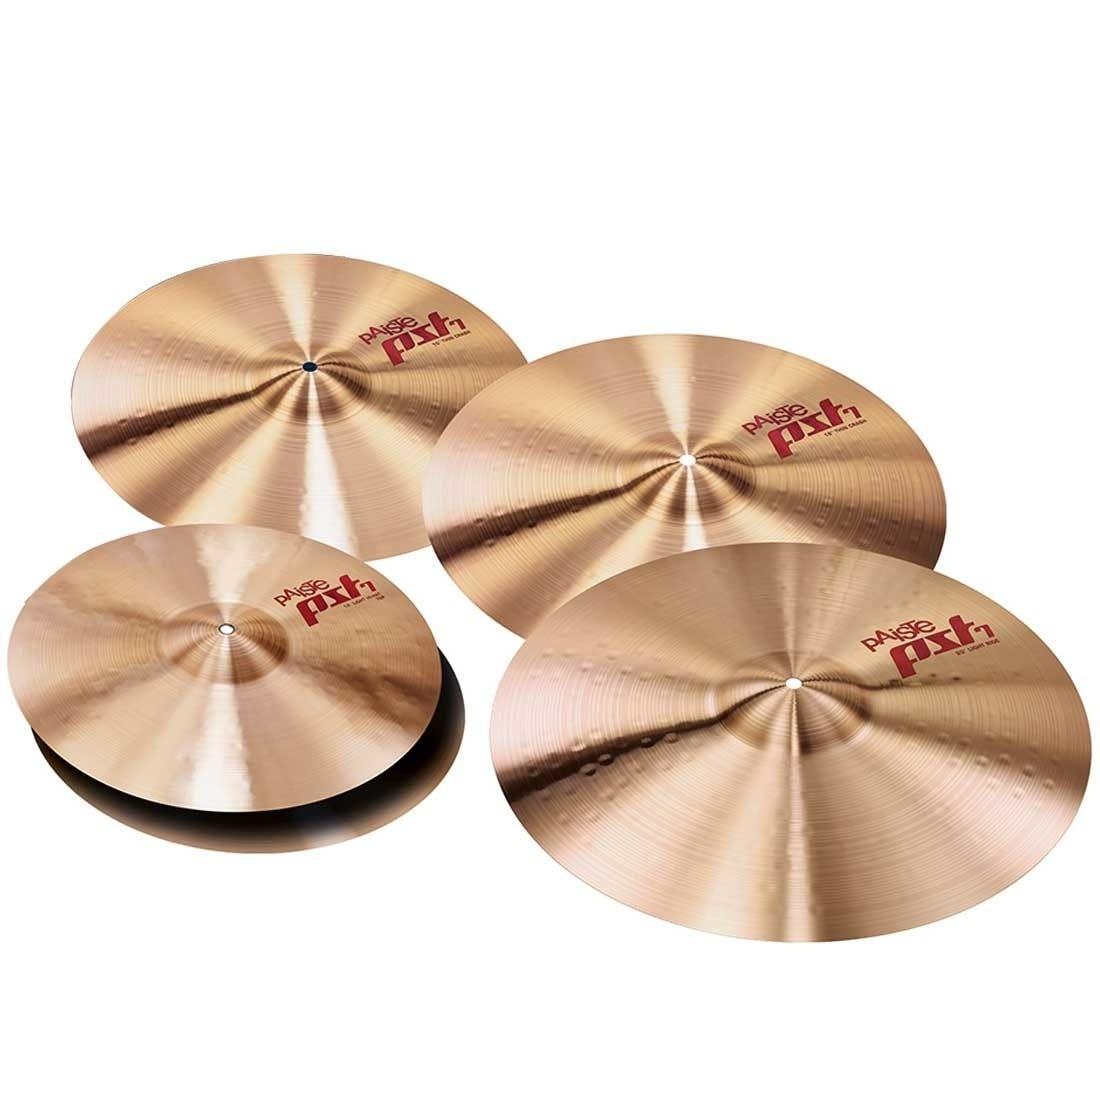 Paiste PST7 14/18/20 Session Cymbal Pack w/BONUS 16